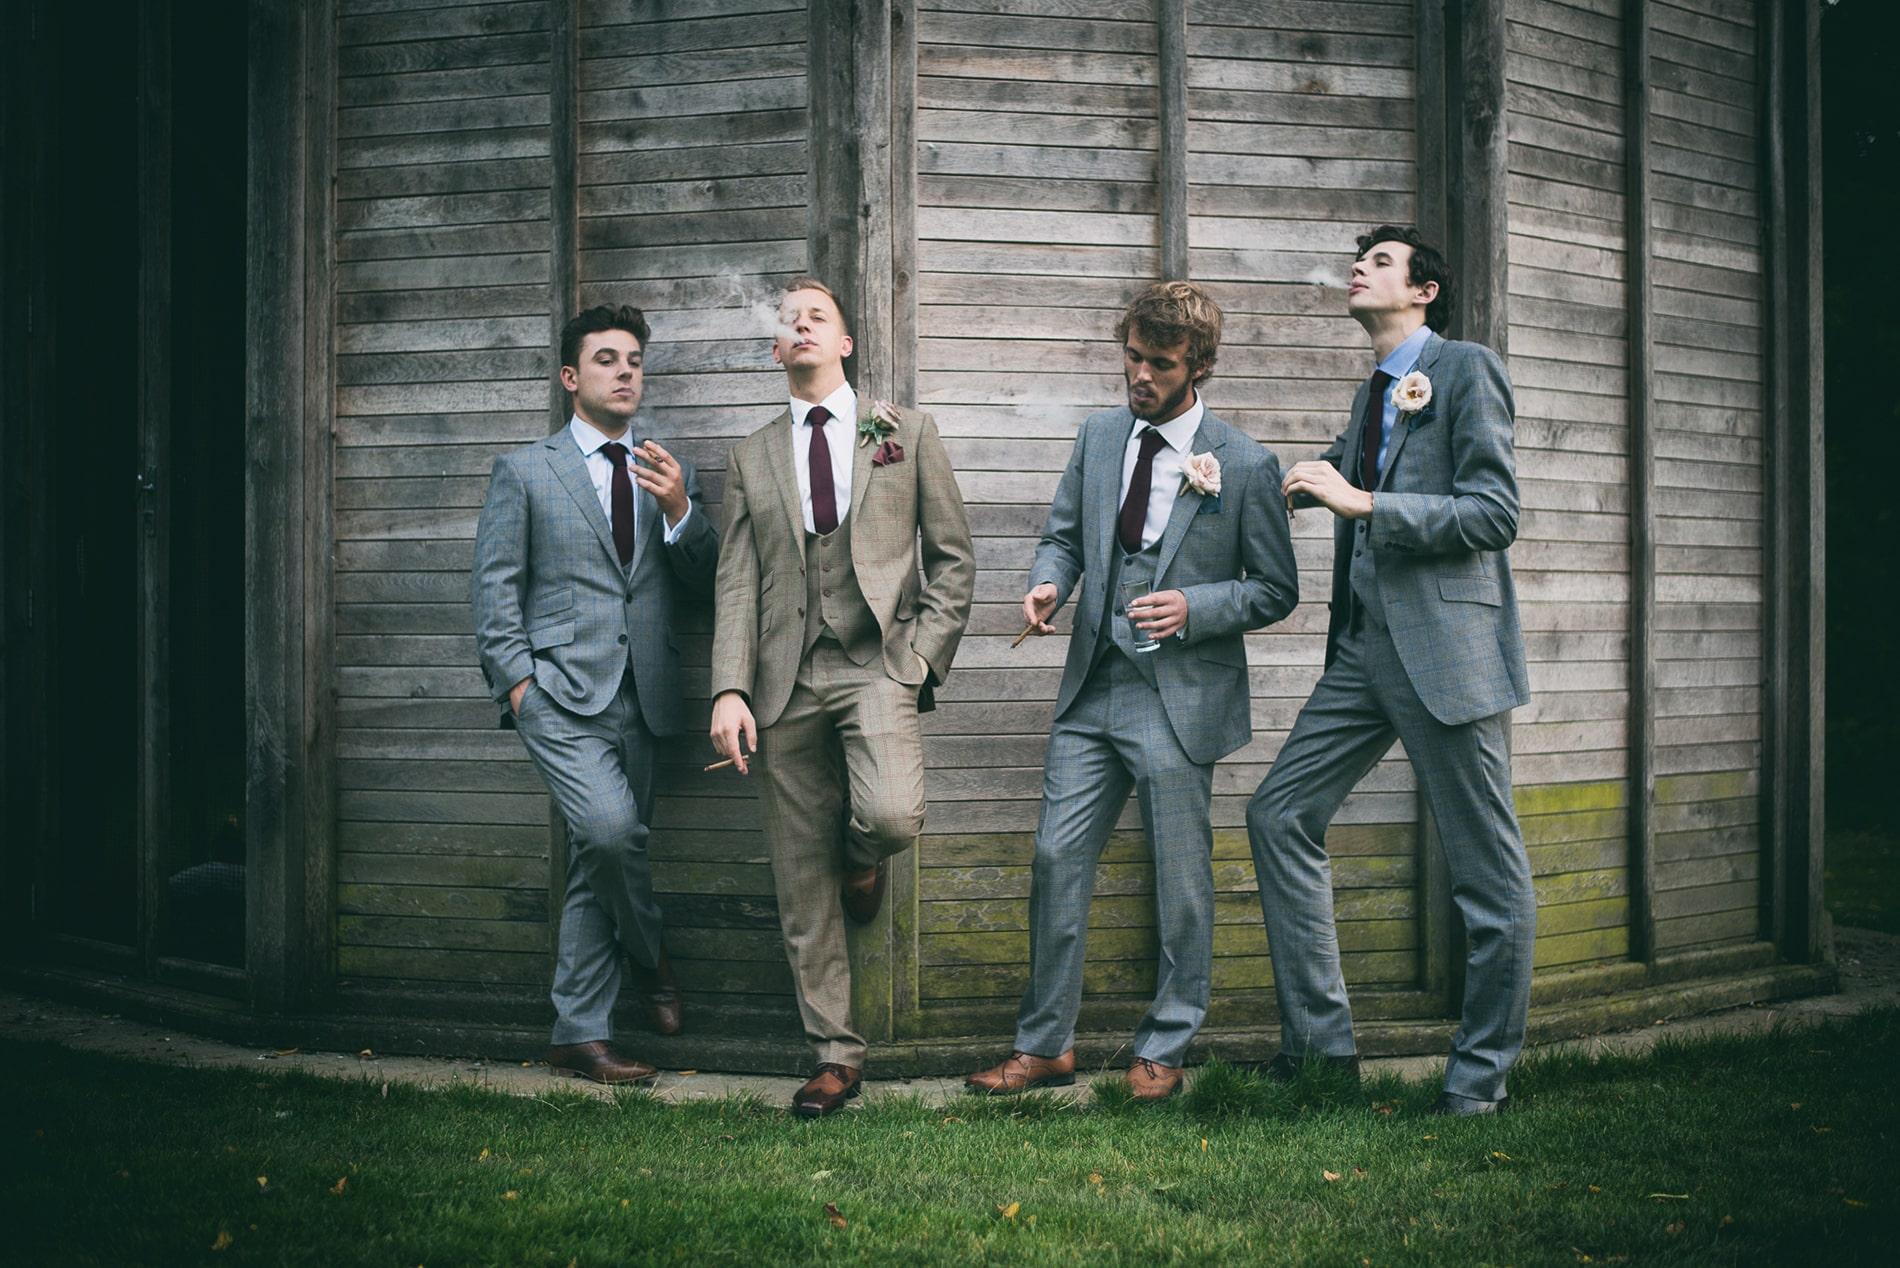 wedding photo checklist, first kiss, groomsmen, best man, how much does a wedding photographer cost, Wedding Photographer Milton Keynes, Milton Keynes Wedding Photography